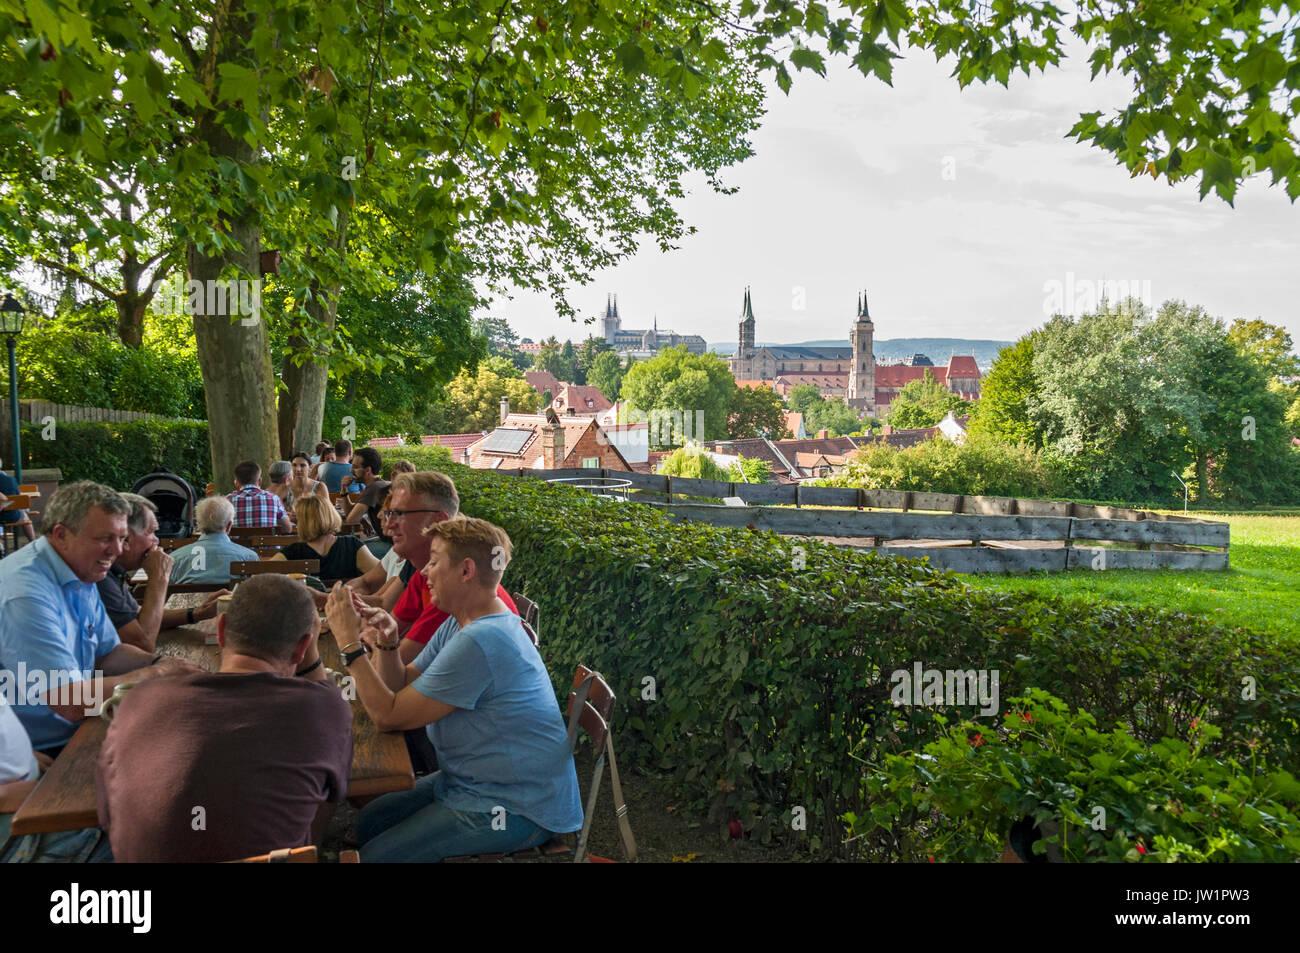 Spezial Keller Biergarten In Bamberg Franken Bayern Deutschland Stockfotografie Alamy